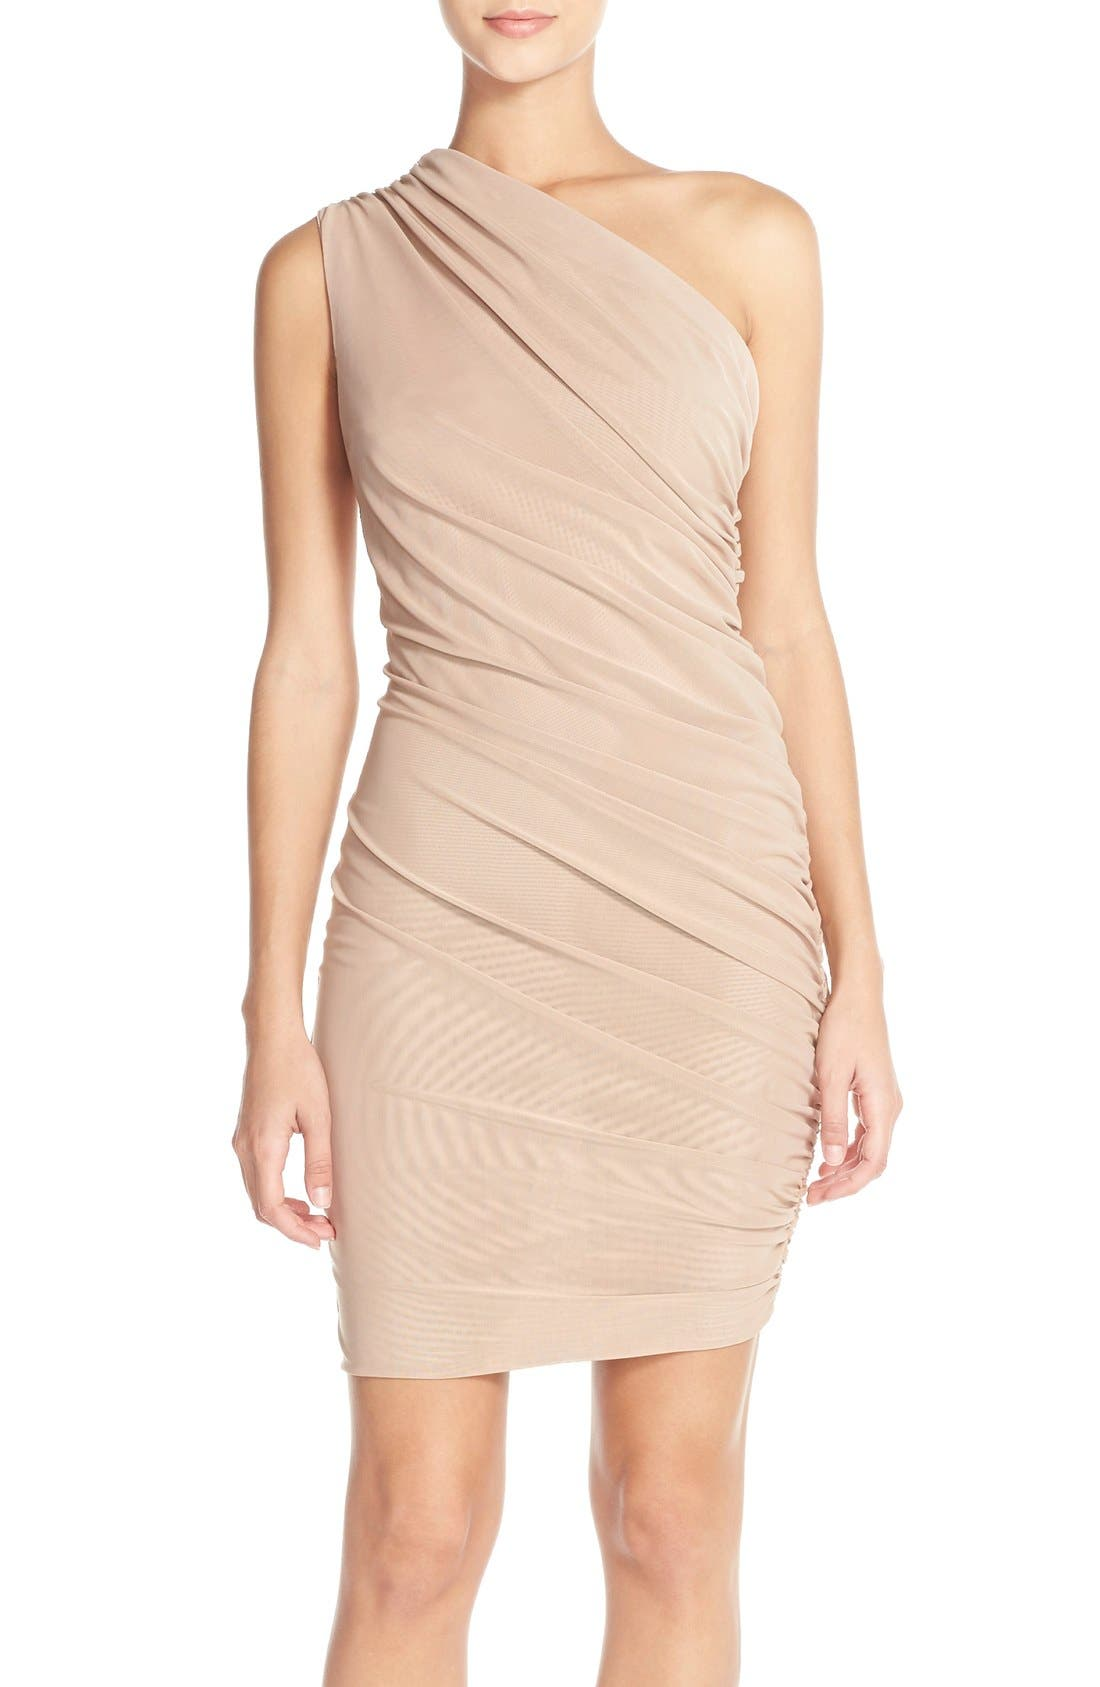 Main Image - Misha Collection 'Shani' One-Shoulder Mesh Body-Con Dress